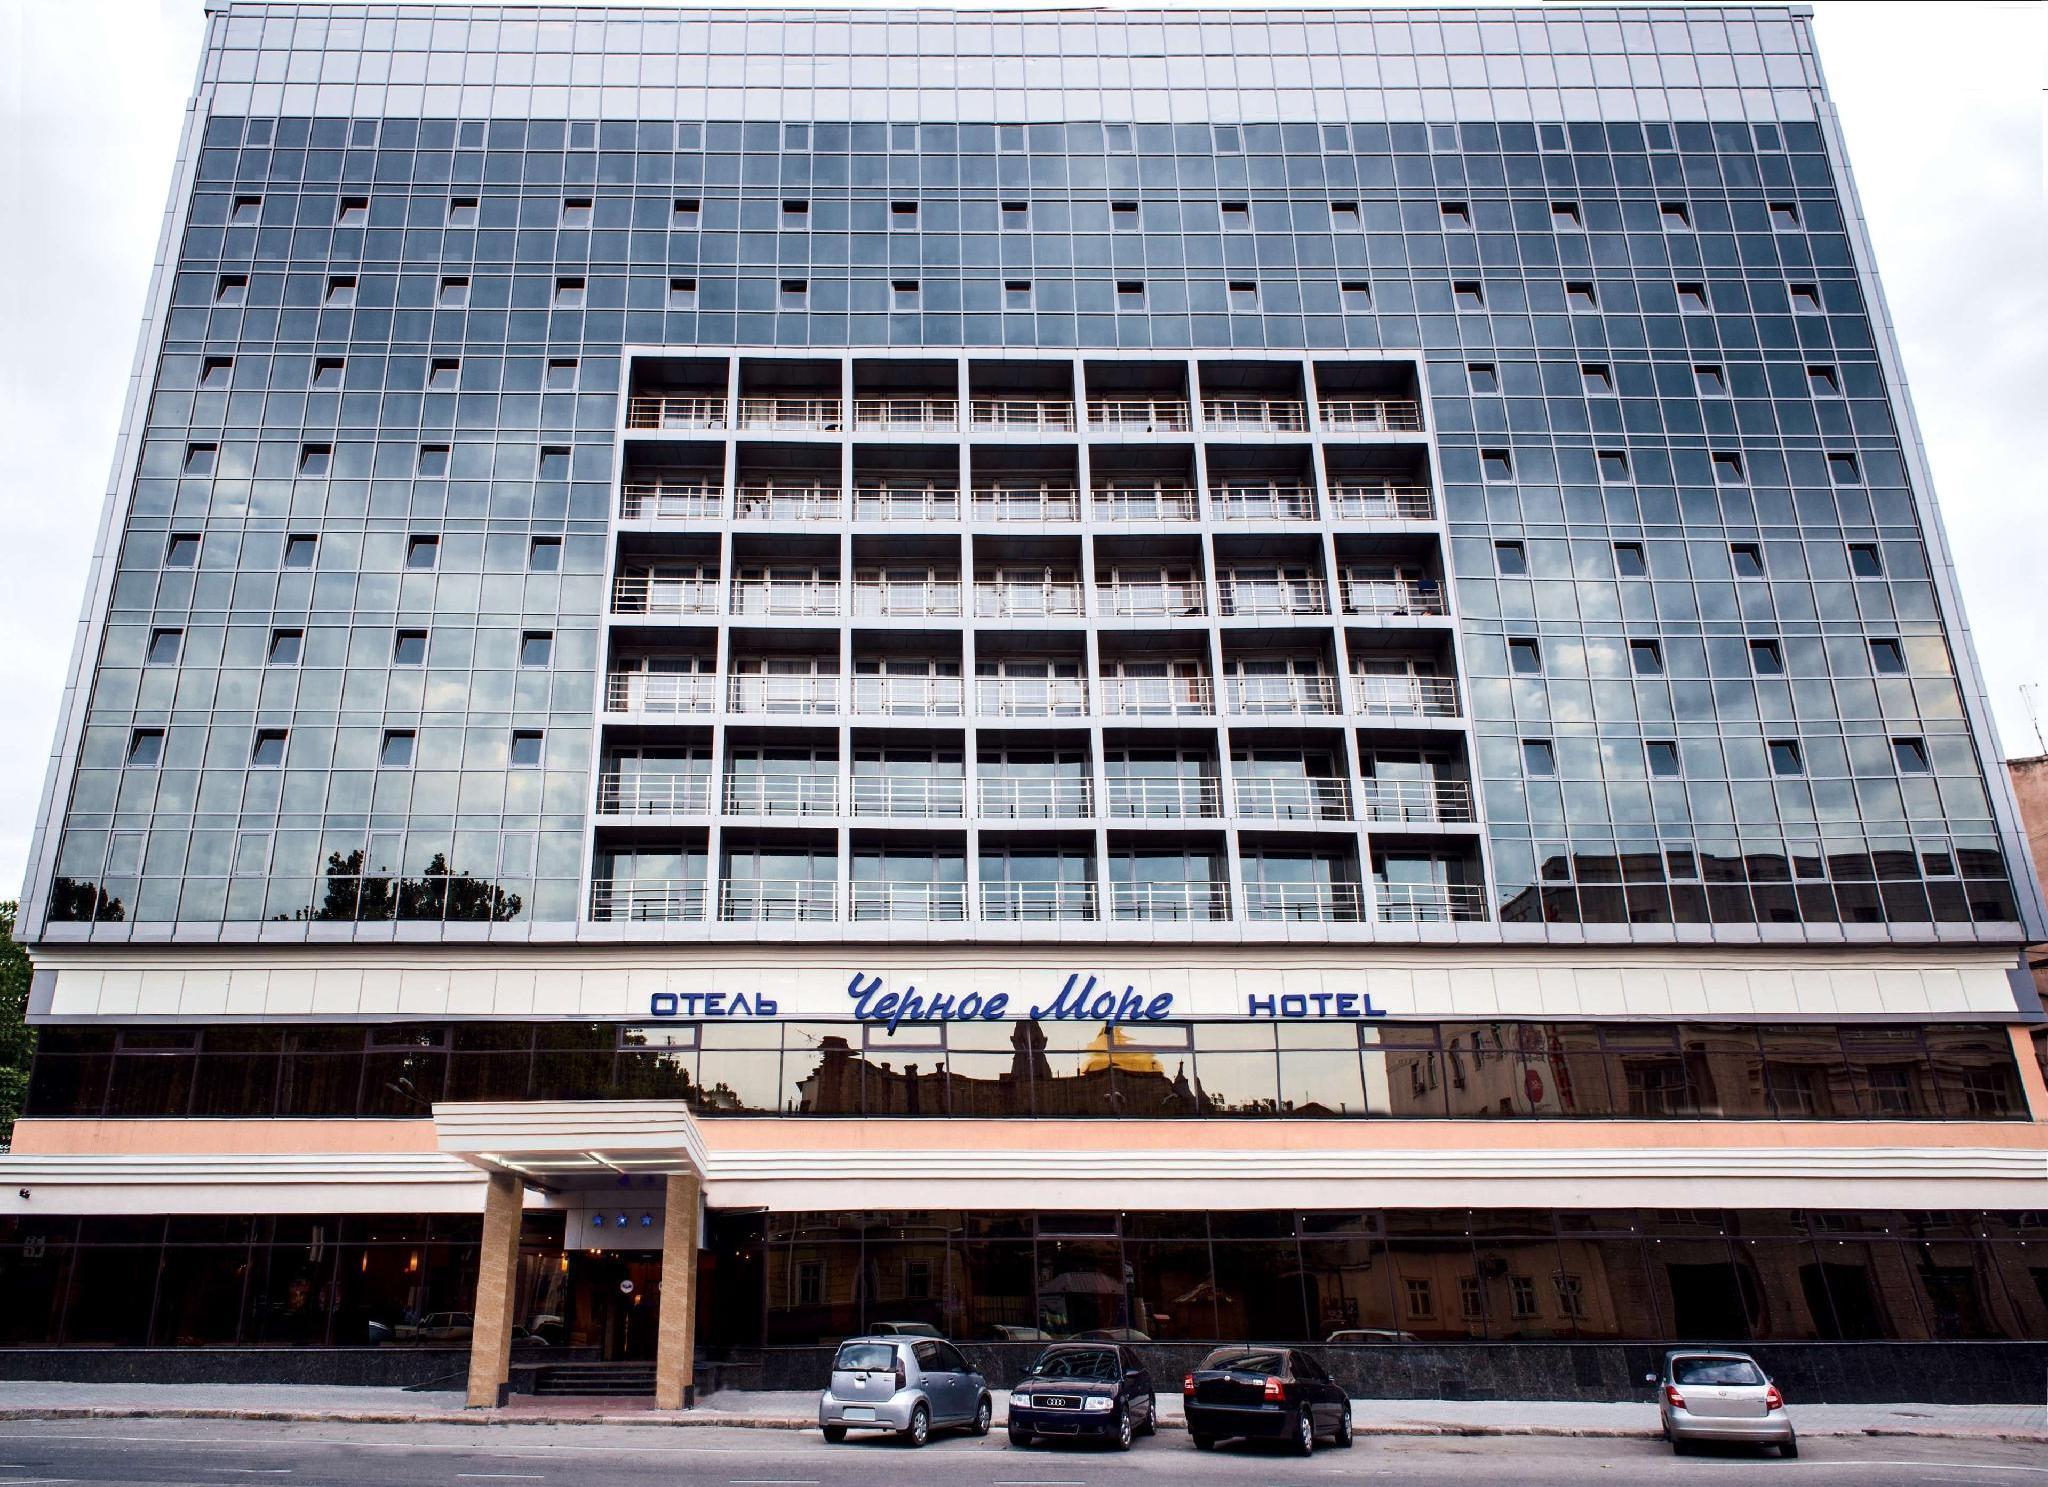 Black Sea Hotel Rishelievskaya